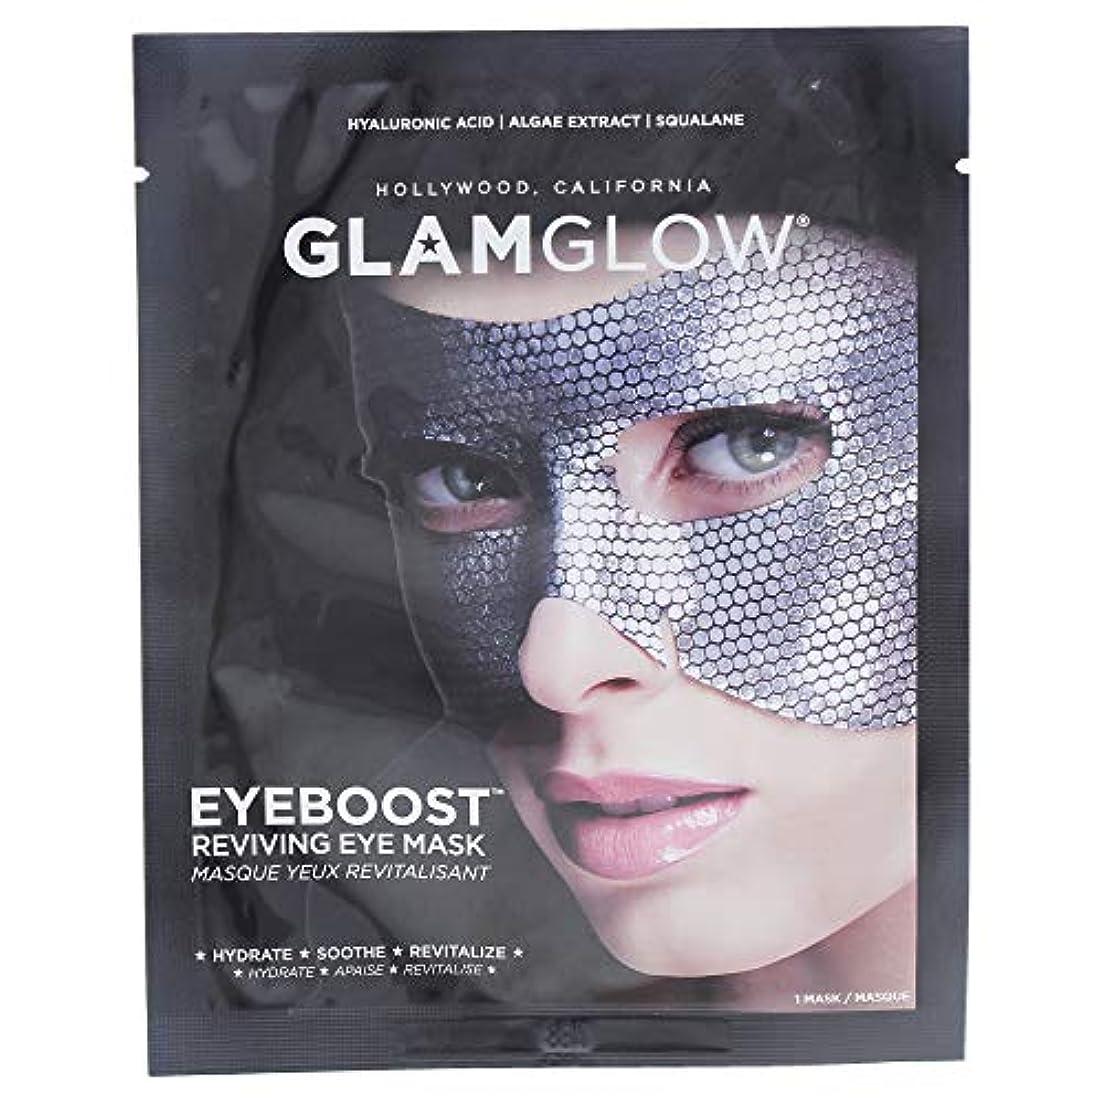 激怒花婿櫛Eyeboost Reviving Eye Mask